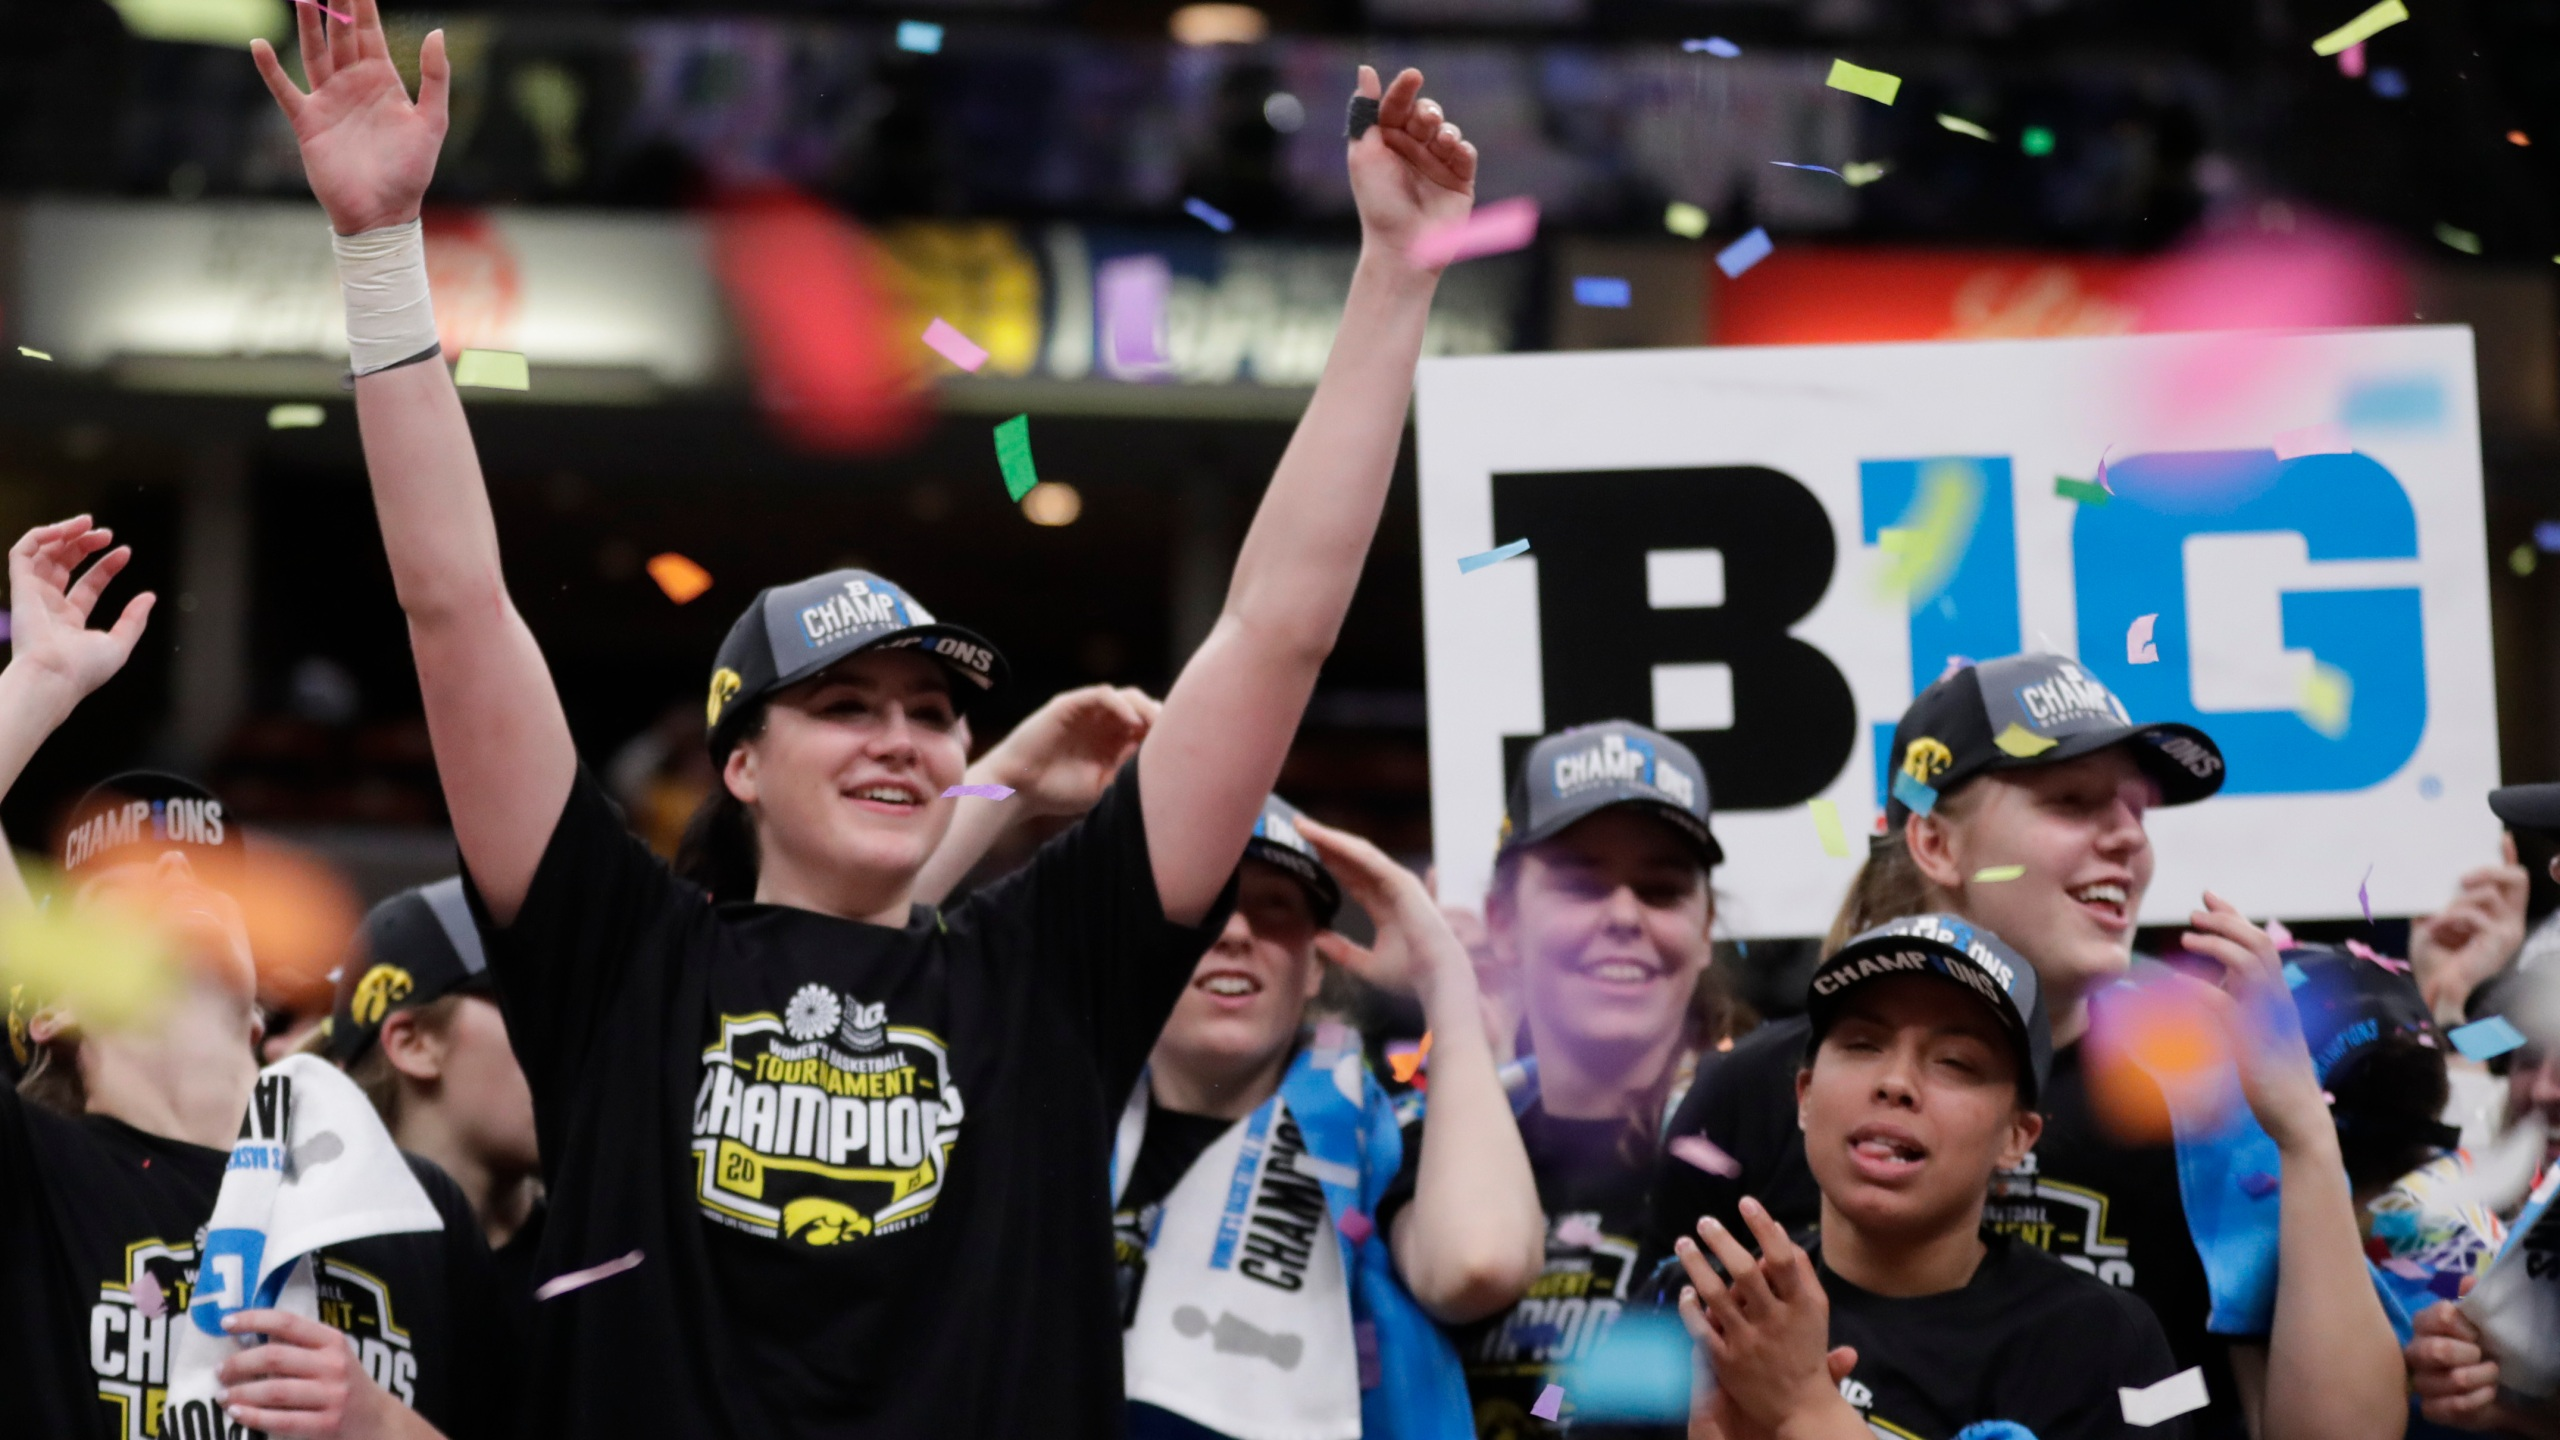 B10_Iowa_Maryland_Basketball_47642-159532.jpg71155808